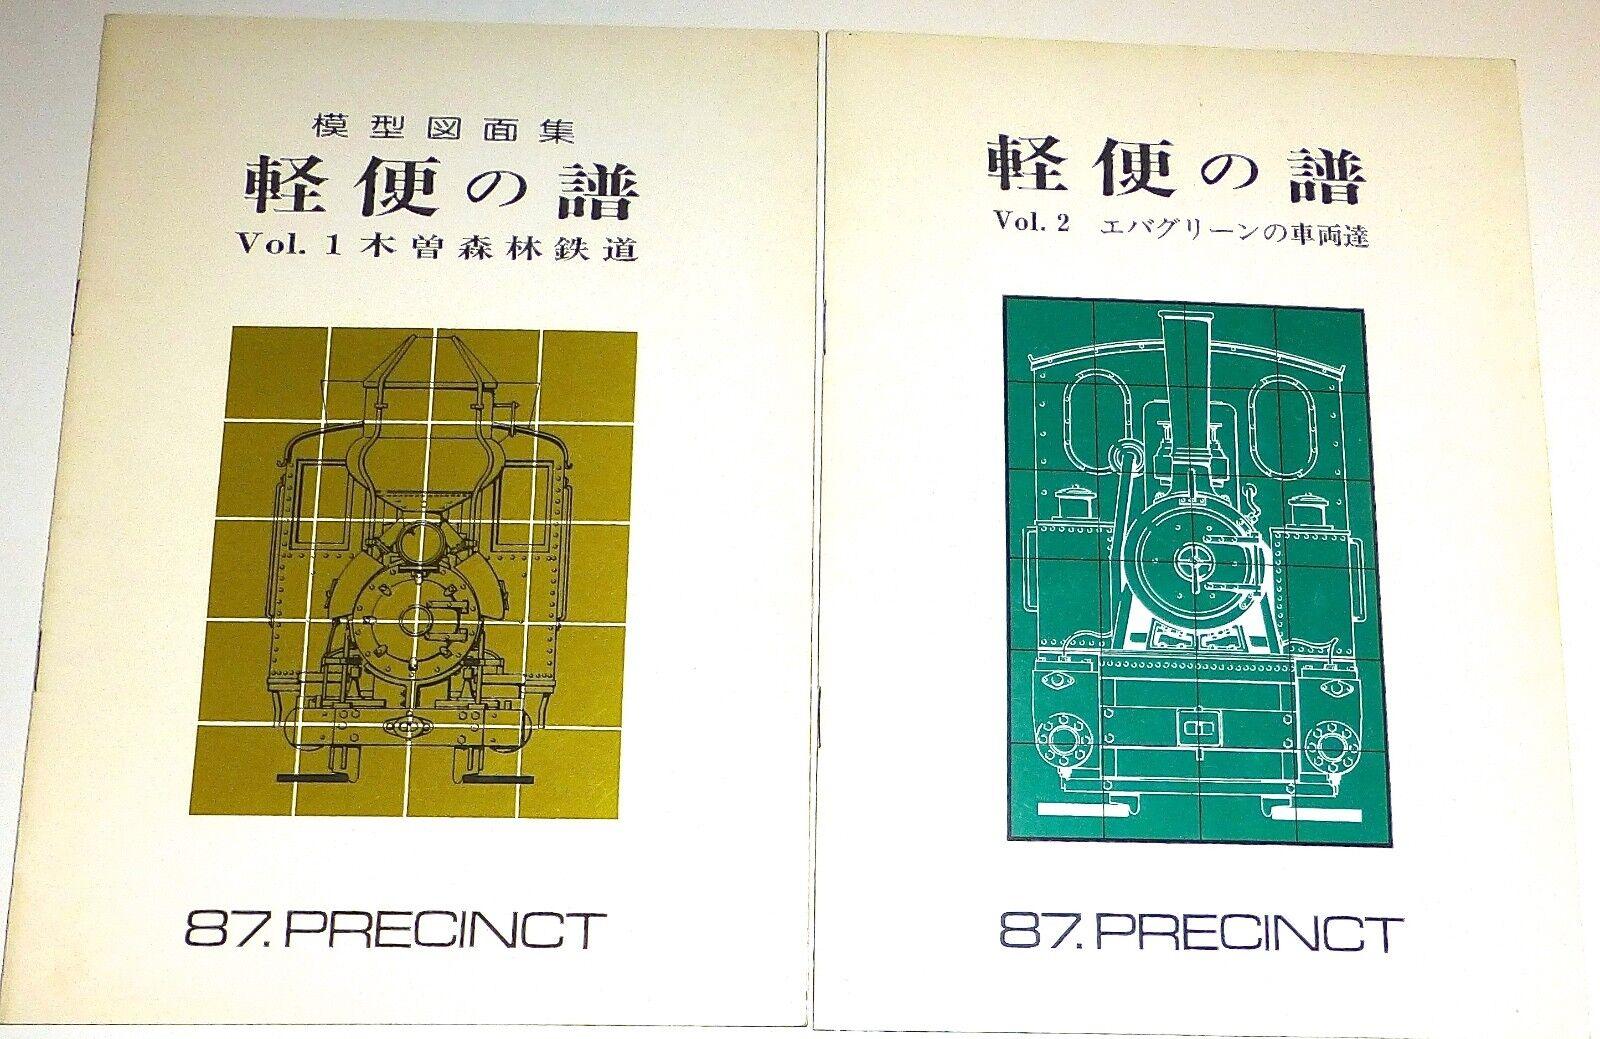 Giappone carreggiata stretta 87. Precinct vol 1 + vol 2 hc4 Å *